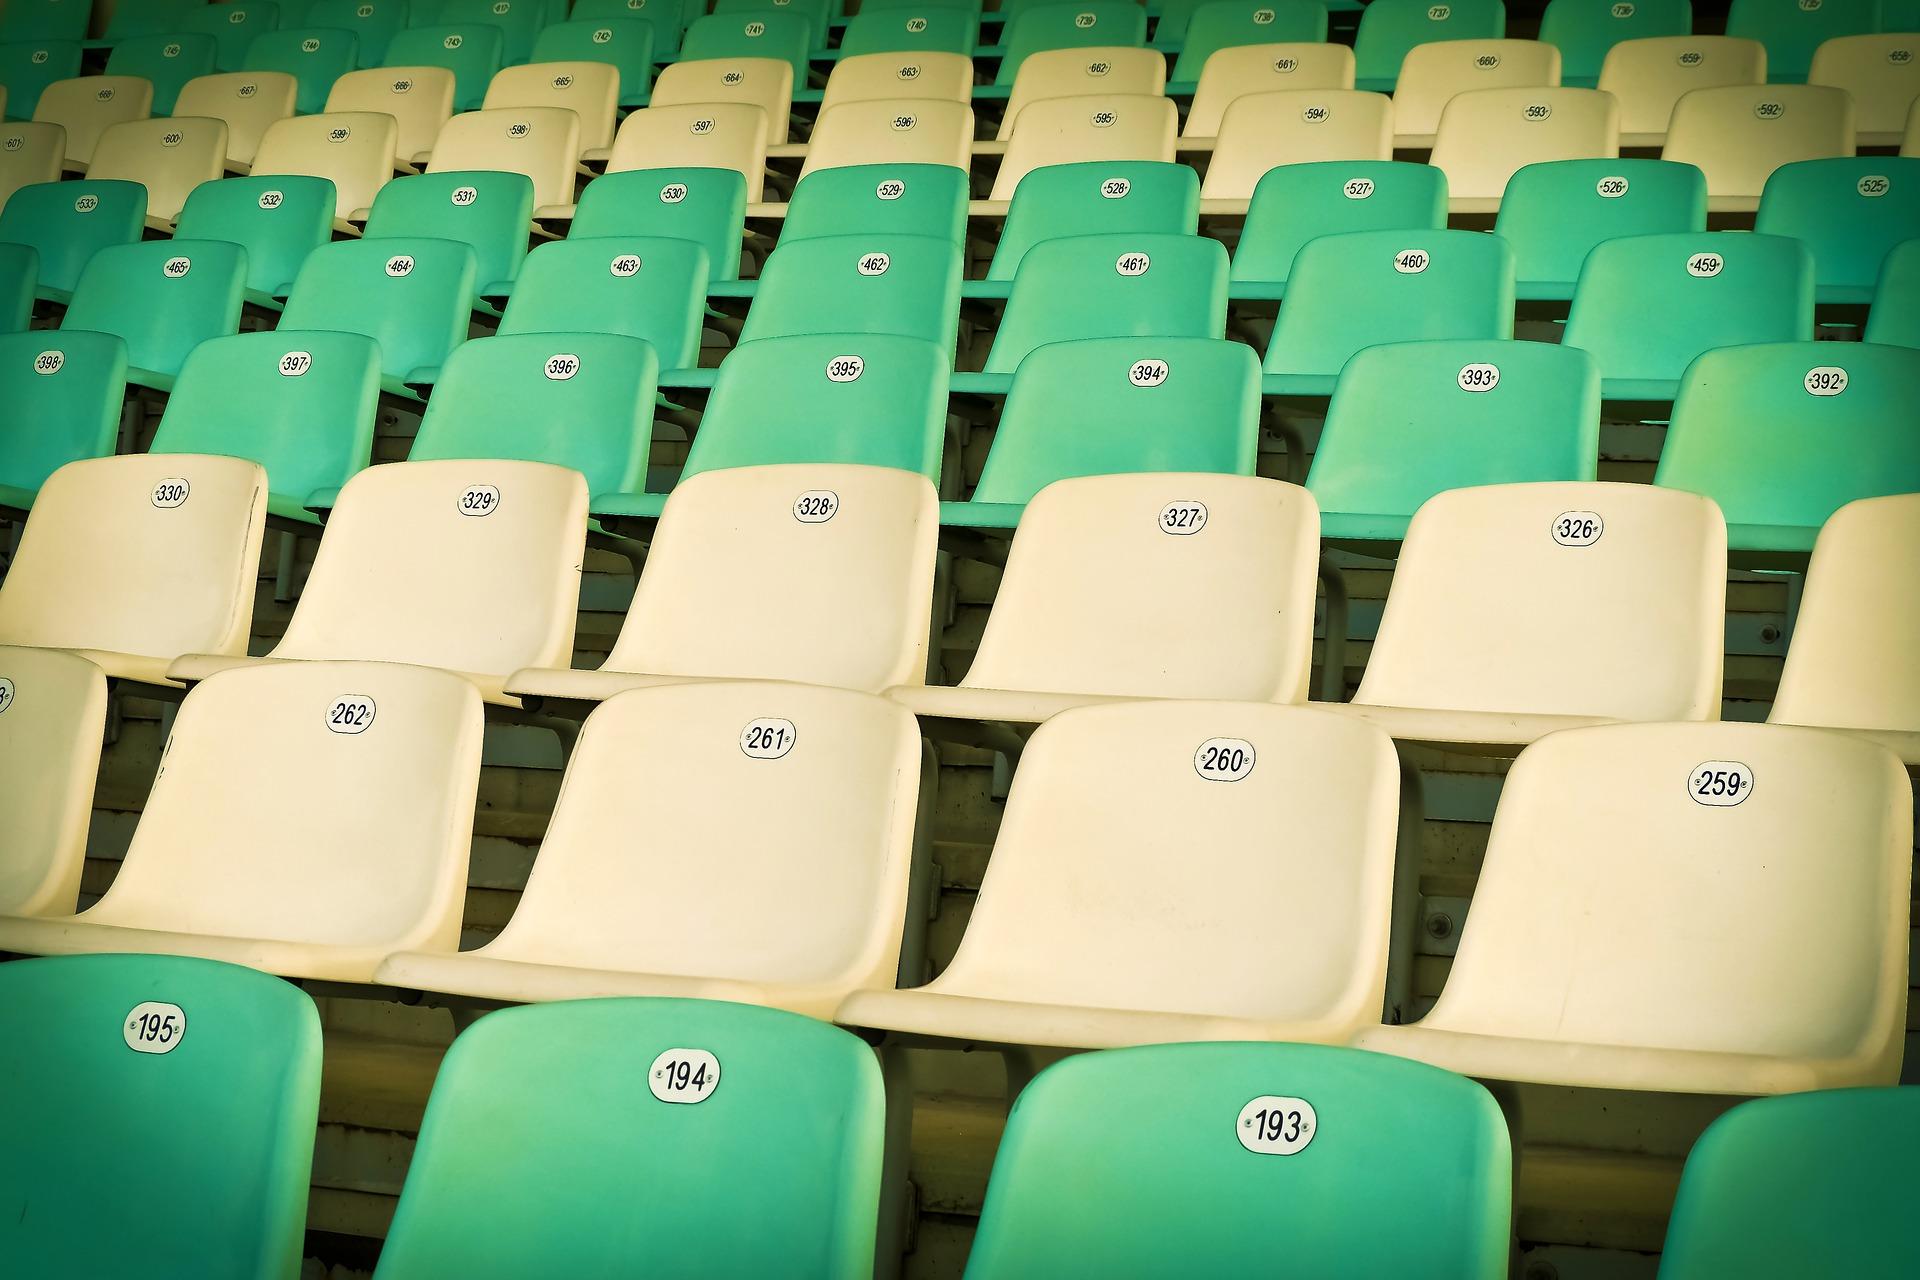 stadium-1750794_1920.jpg